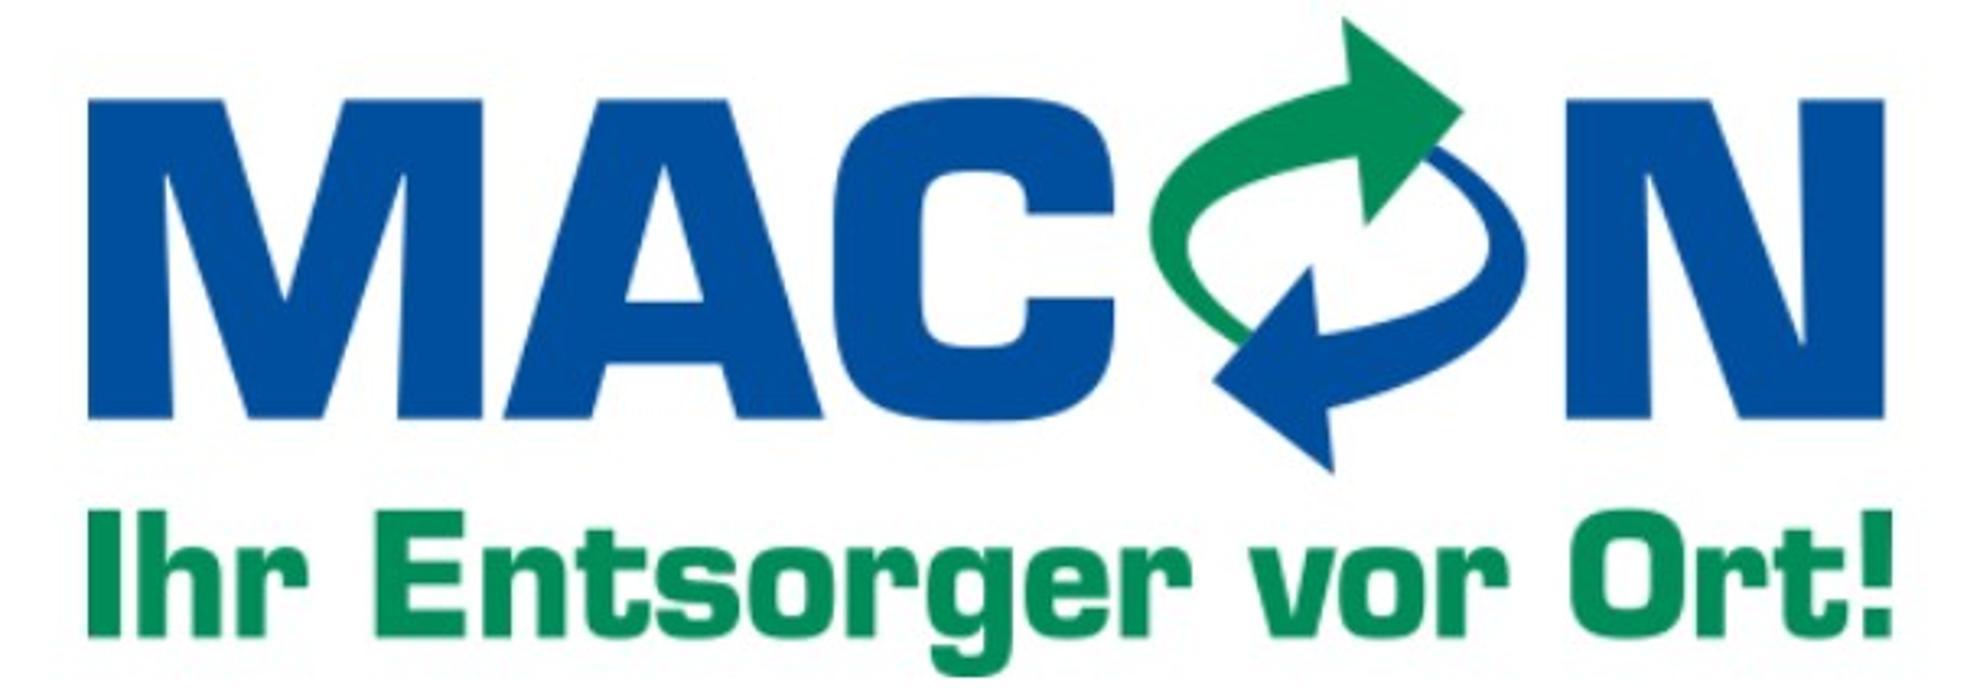 MACON GmbH Entsorgung Recycling Umweltberatung